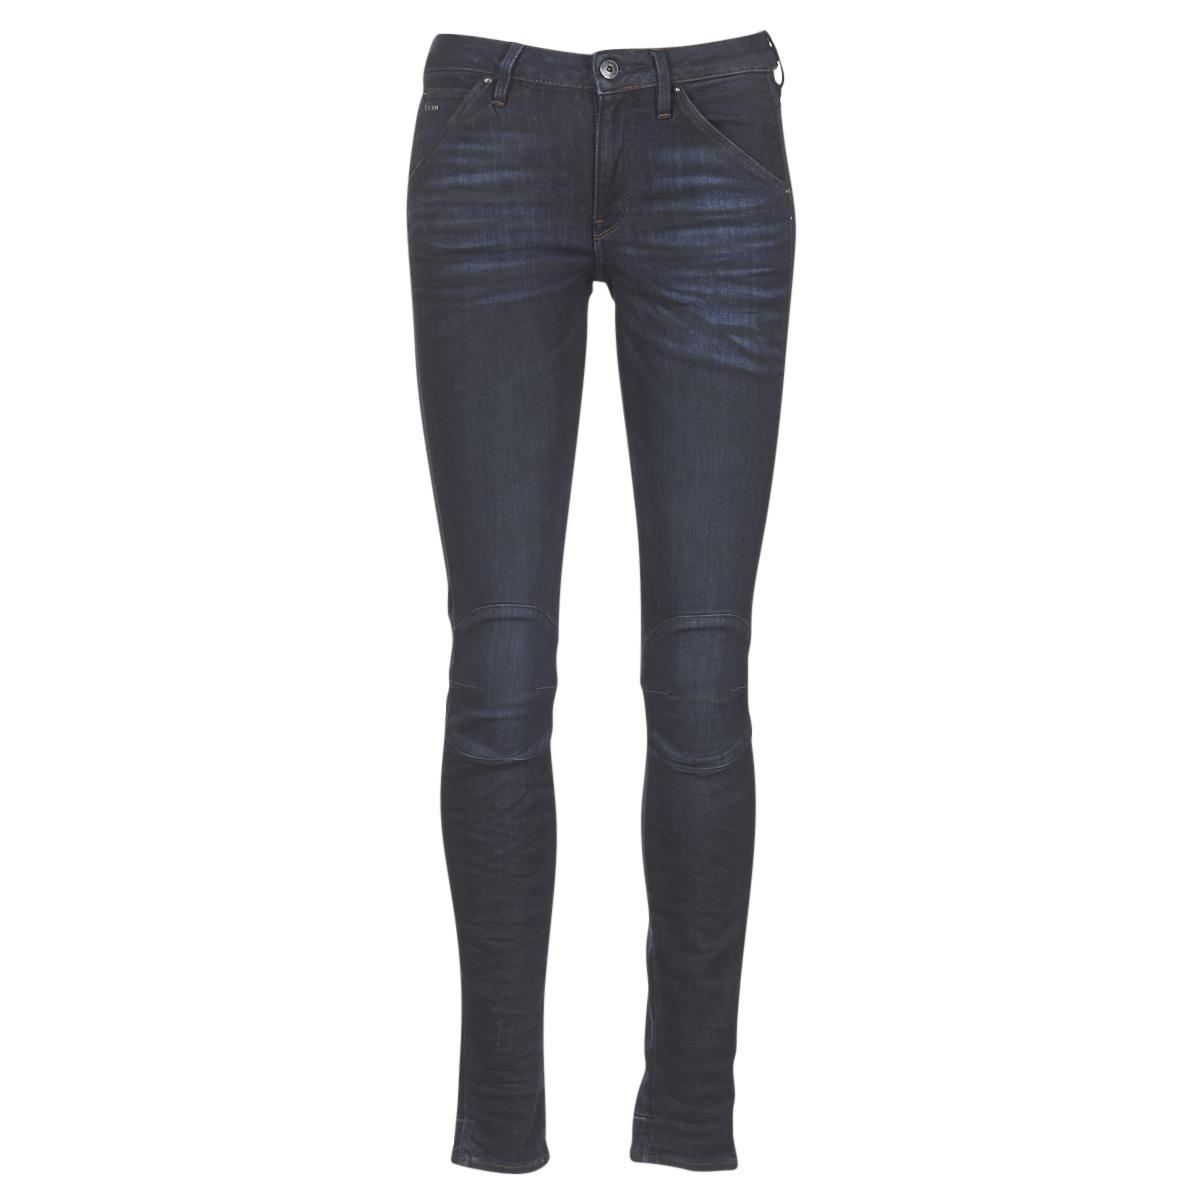 Jeans - skinny G-Star Raw  5622 MID SKINNY